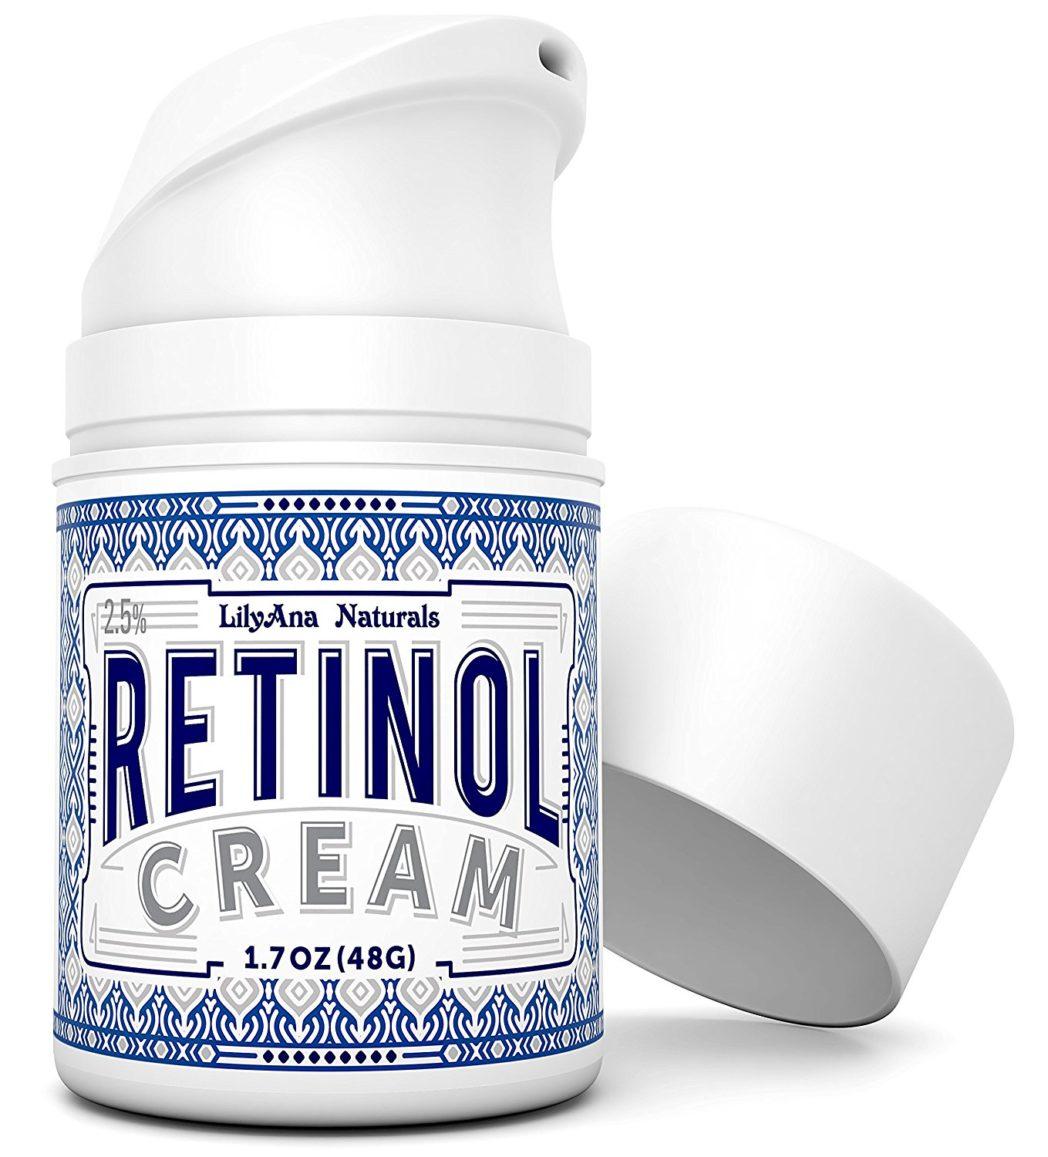 Best Korean Retinol Cream | Best Selling Korean Skin Care Products